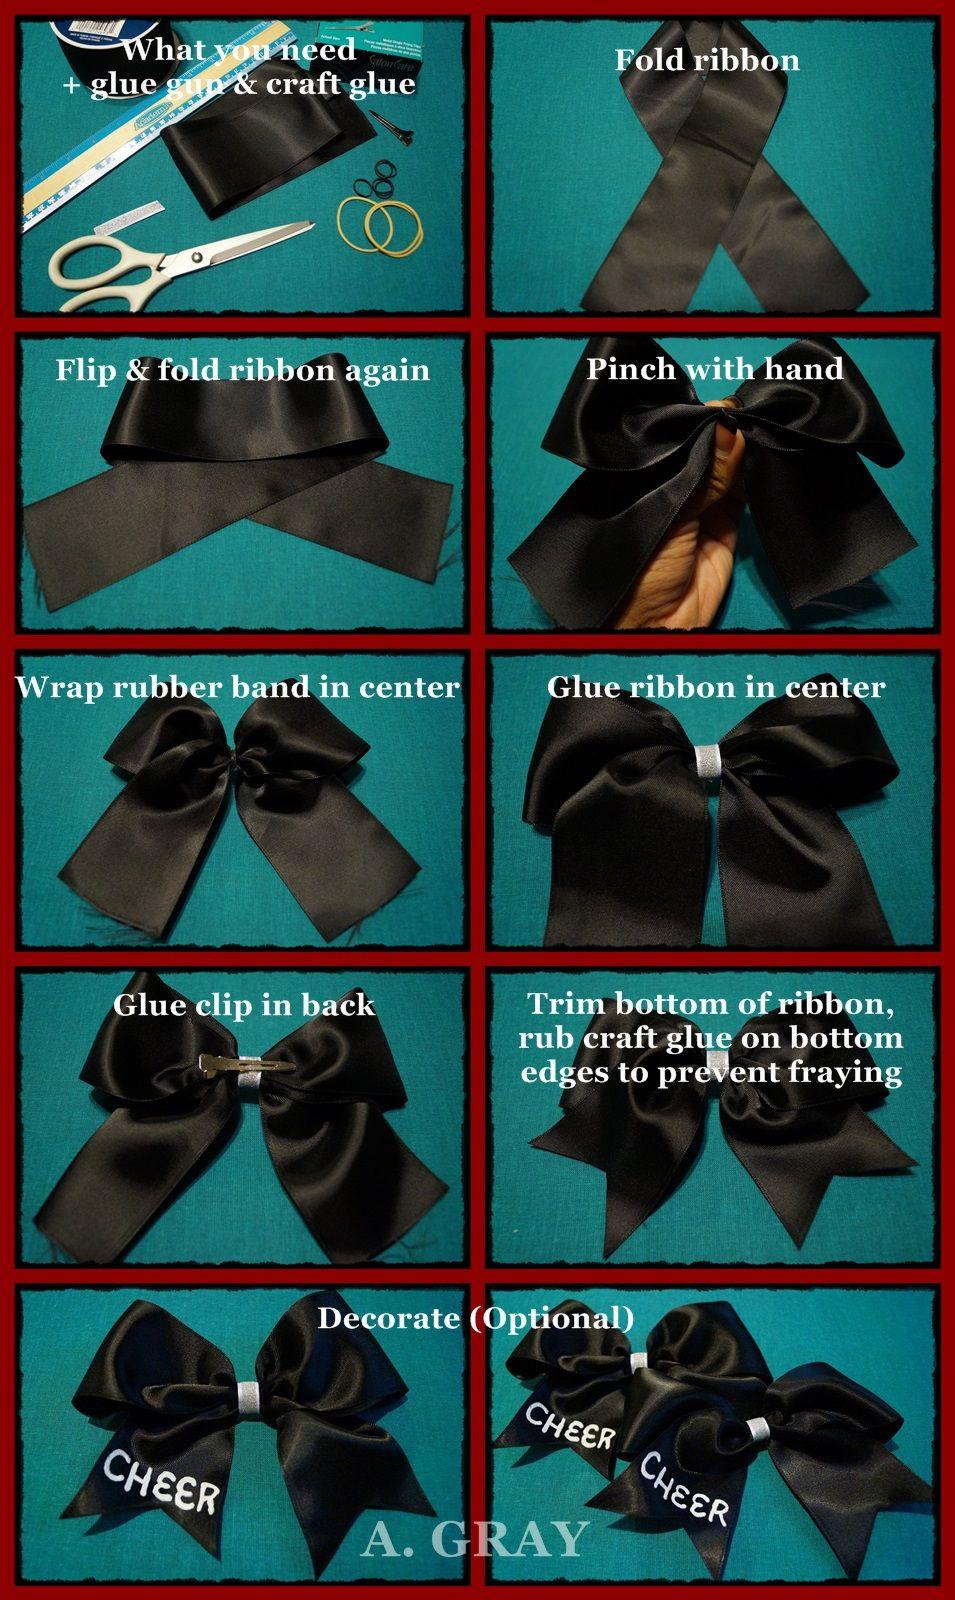 Diy Easy No Sew Cheer Bow Like Our Page Https Www Facebook Com Cheeramericaroseville Cheer Bows Diy Cheer Hair Cheerleading Bows